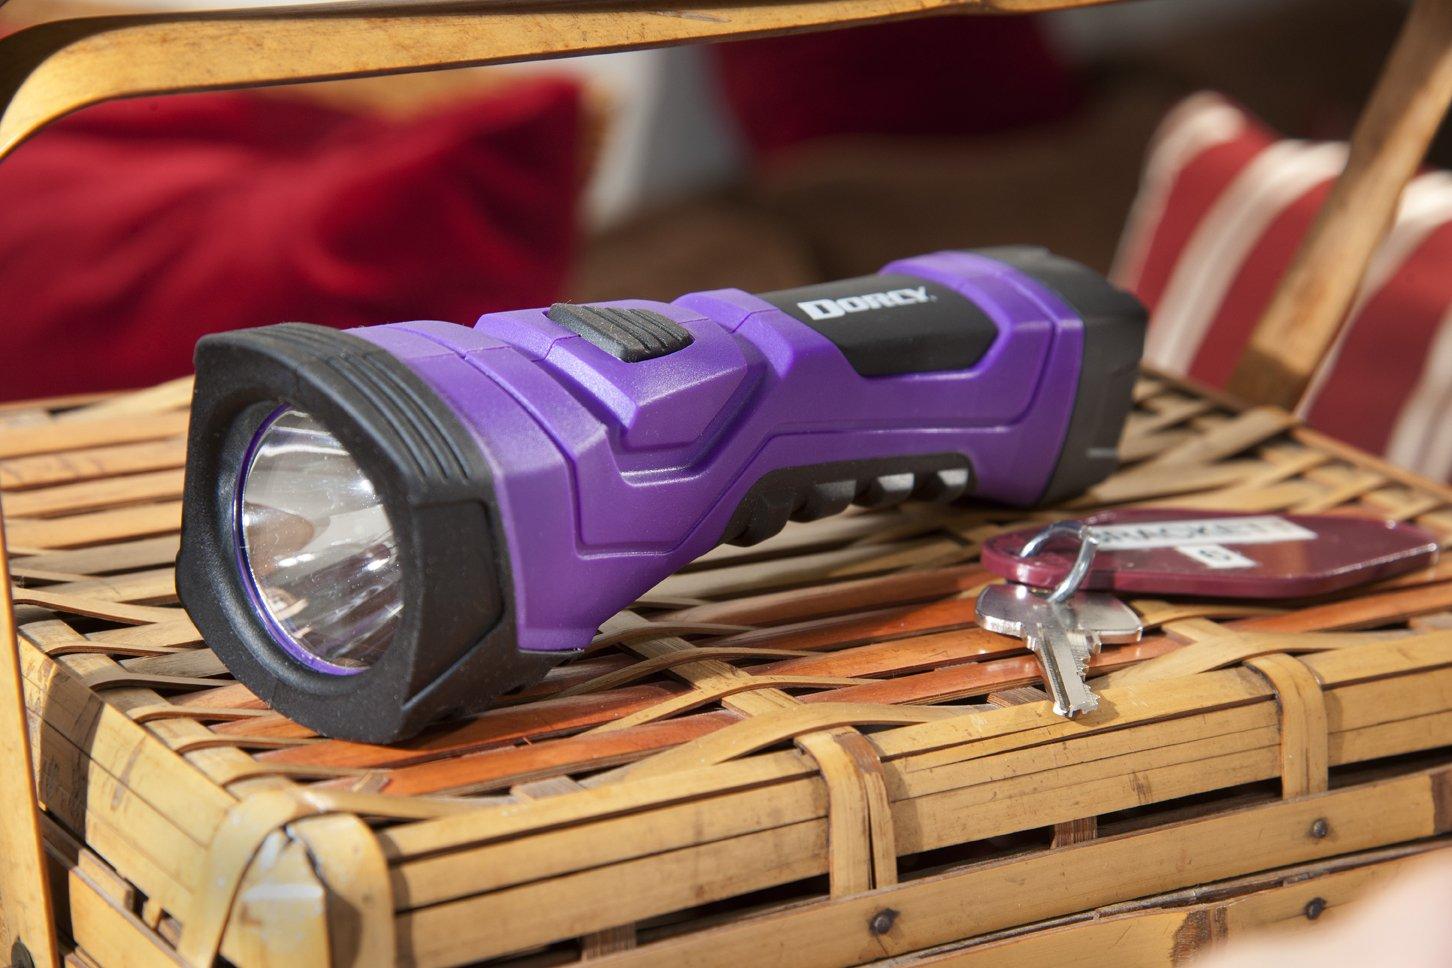 Dorcy International 41 4753 Pink 41-4753 Dorcy 190-Lumen CyberLight Weather Resistant LED Flashlight with Nylon Lanyard